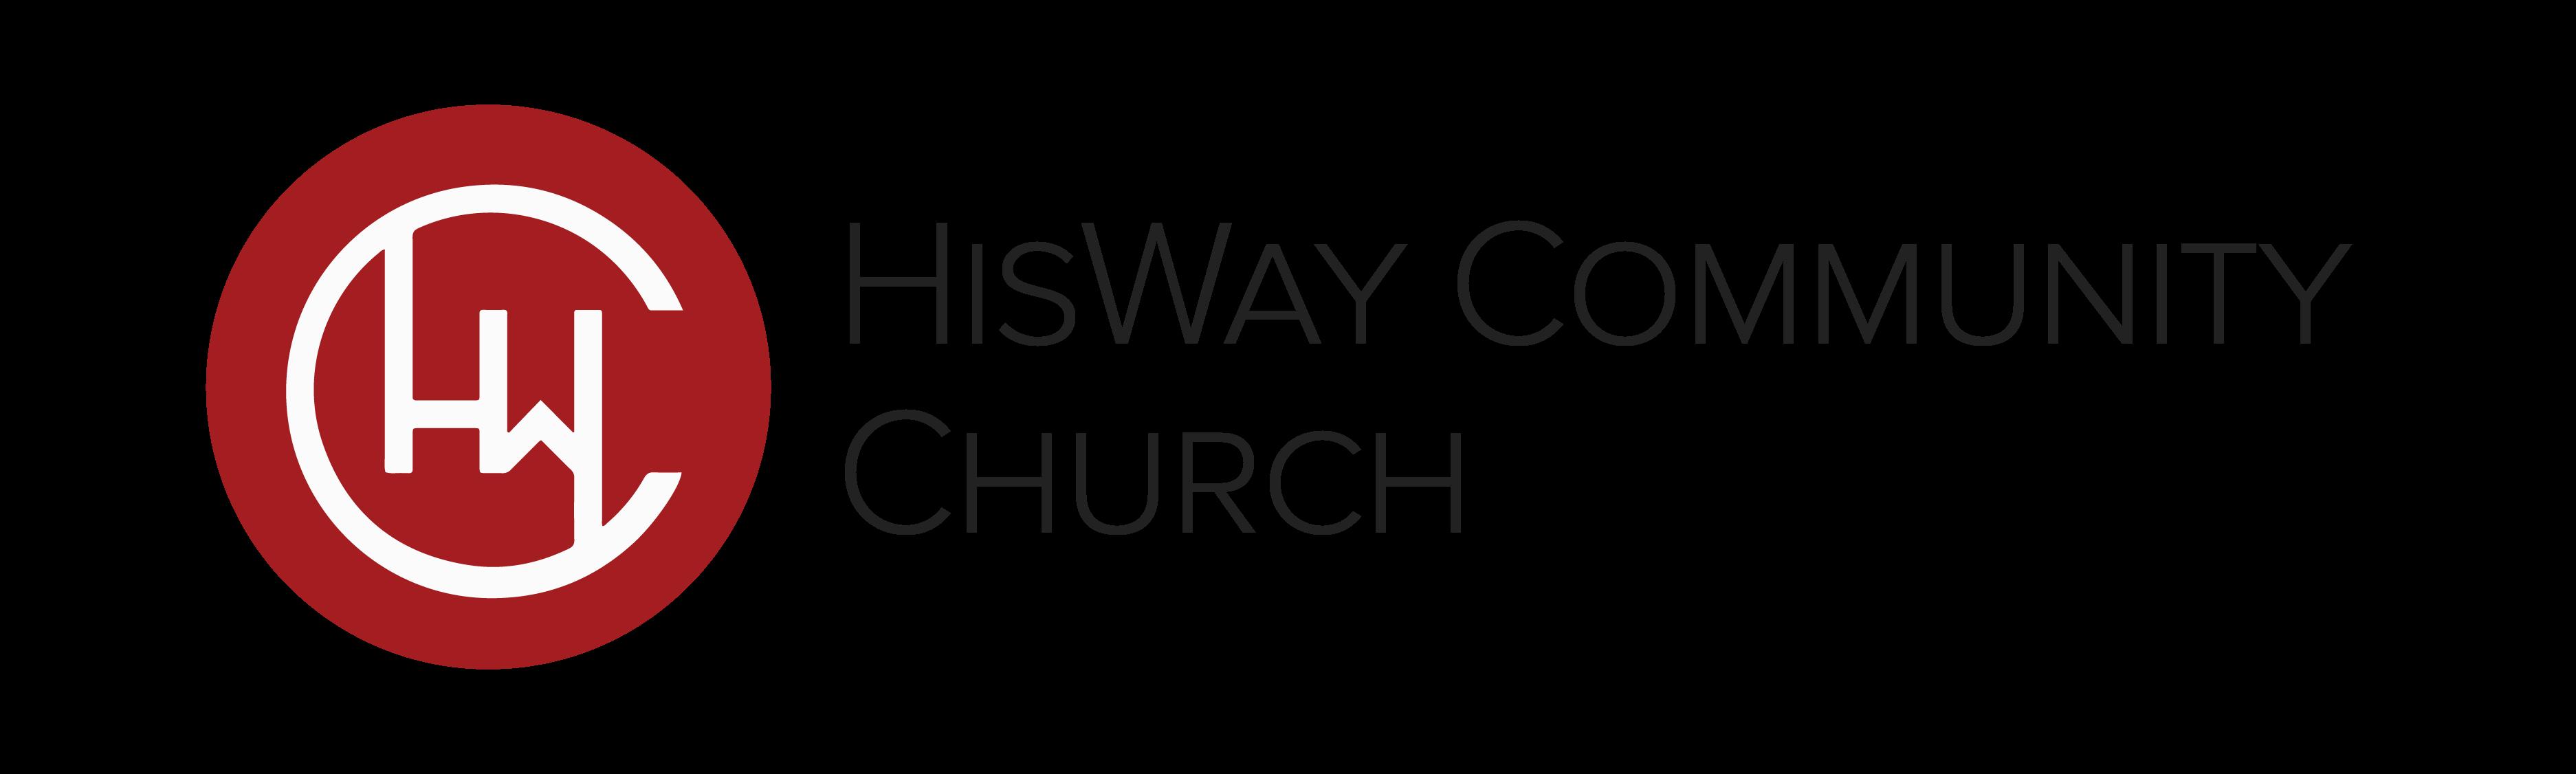 HisWay Community Church